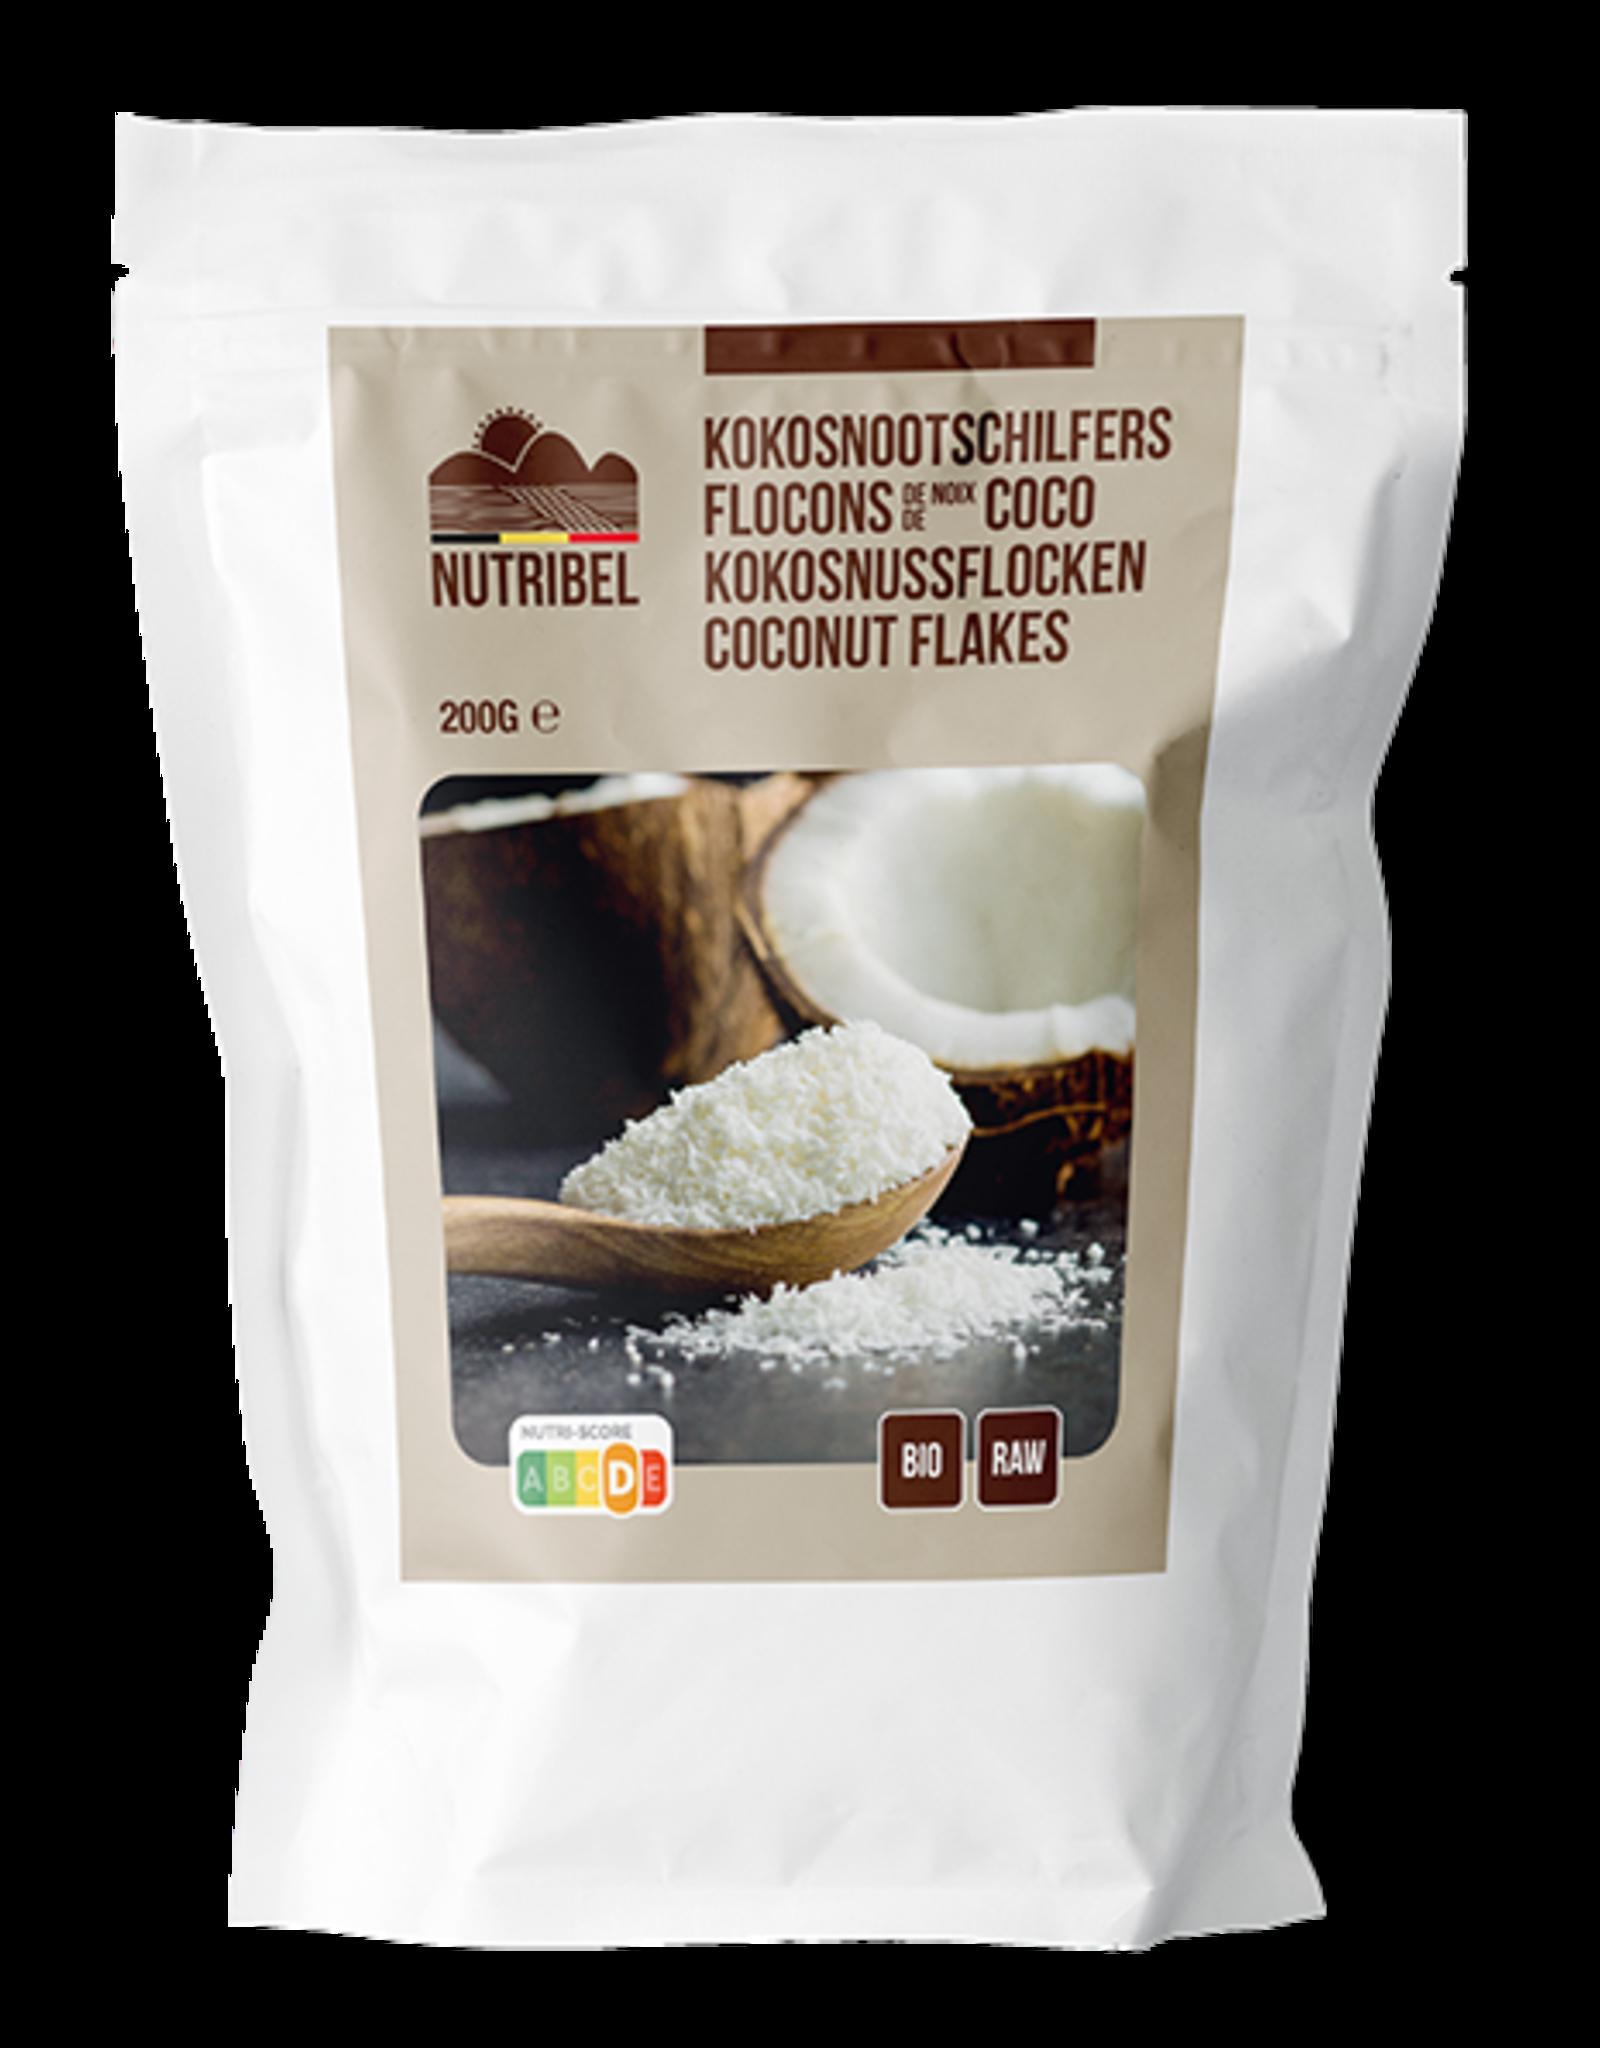 Nutribel Kokosnoot schilfers bio & raw 200g